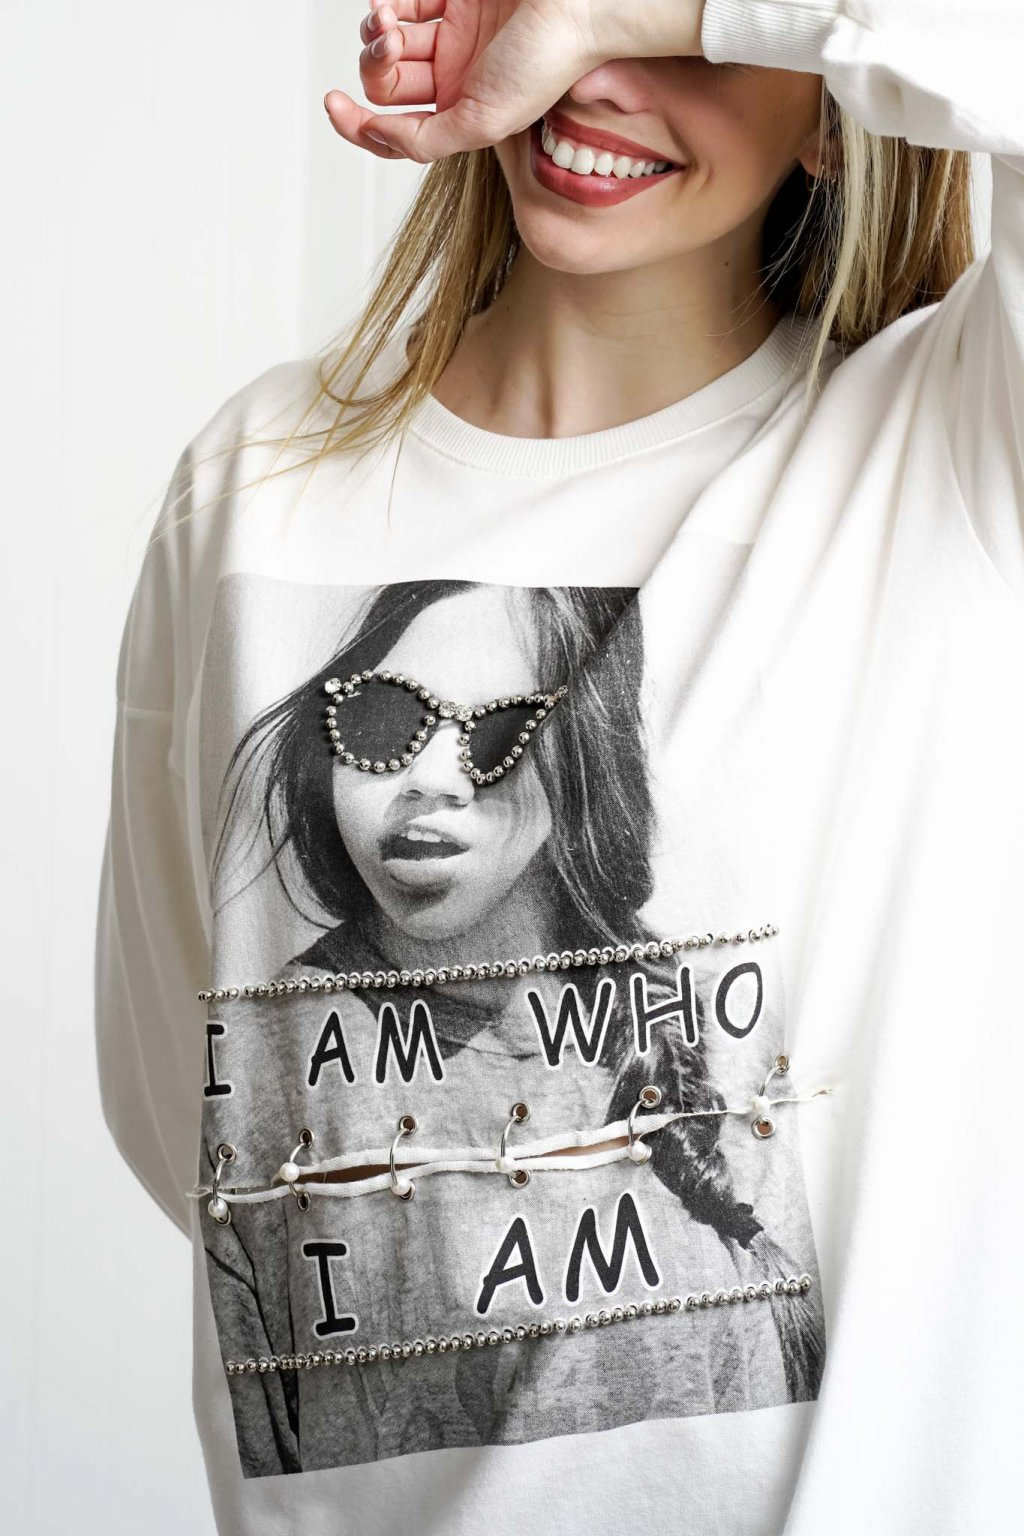 mikina, dámska, oversize, čierna, biela, farebná, športová, elegantná, štýlová, cribs oblečenie, dámske oblečenie, 095